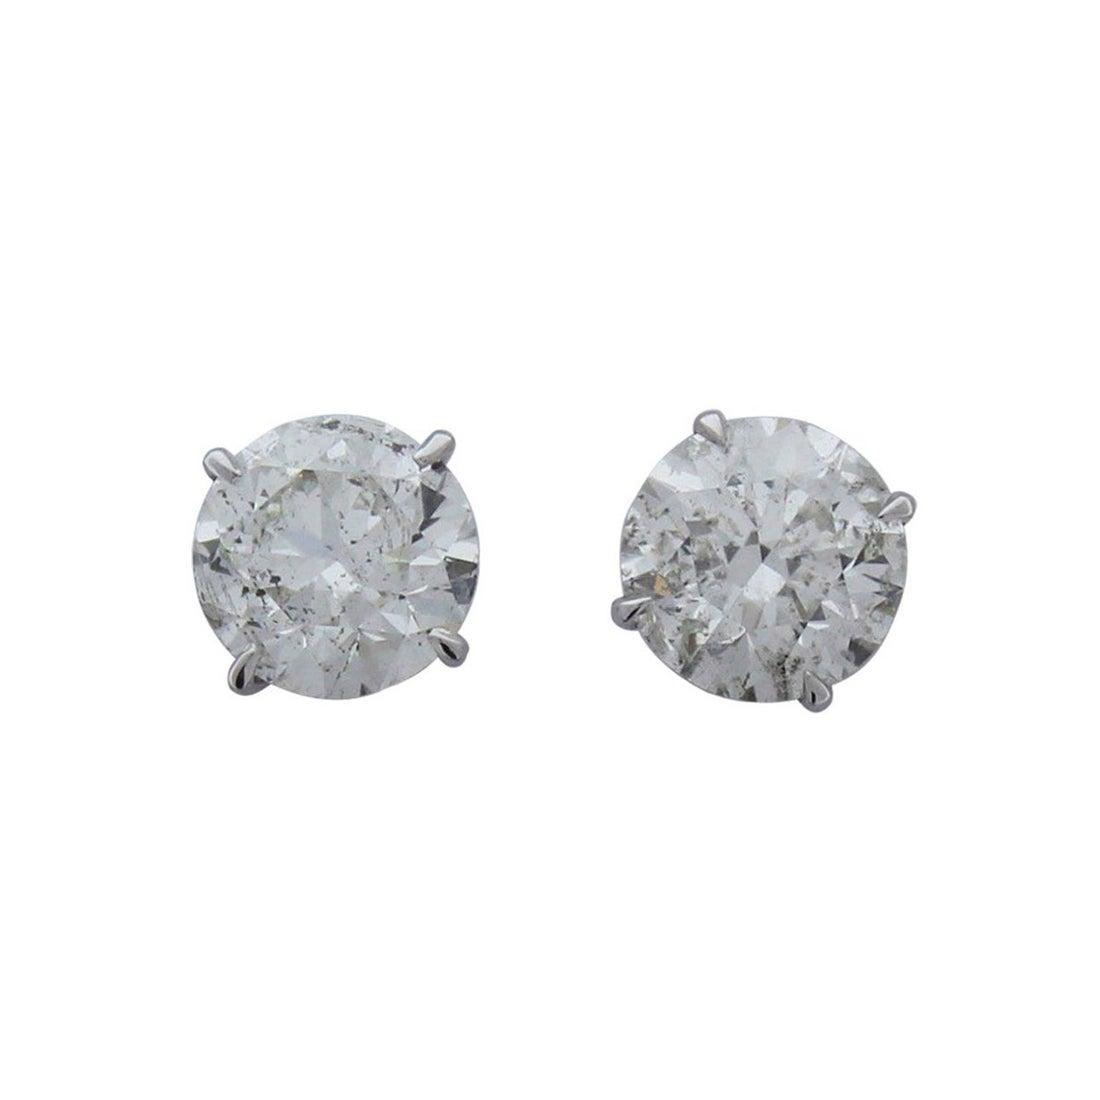 5.09 Carat Total Diamond Stud Earrings in 14 Karat White Gold